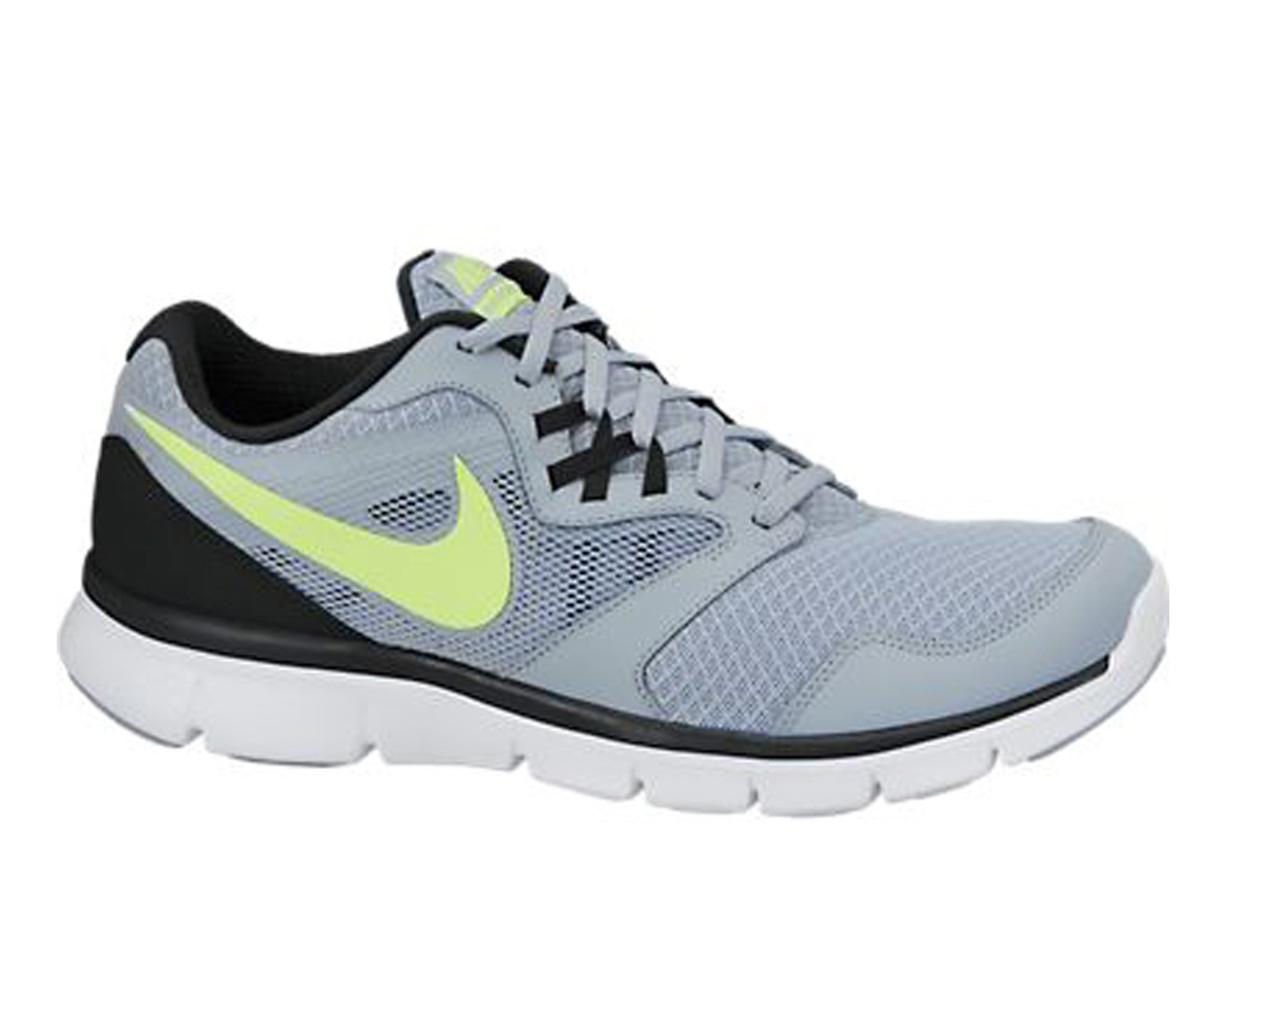 7f04cd3c409c1 Nike Men s Flex Experience Run 3 Running Shoes Magnet Grey Volt - Shop now